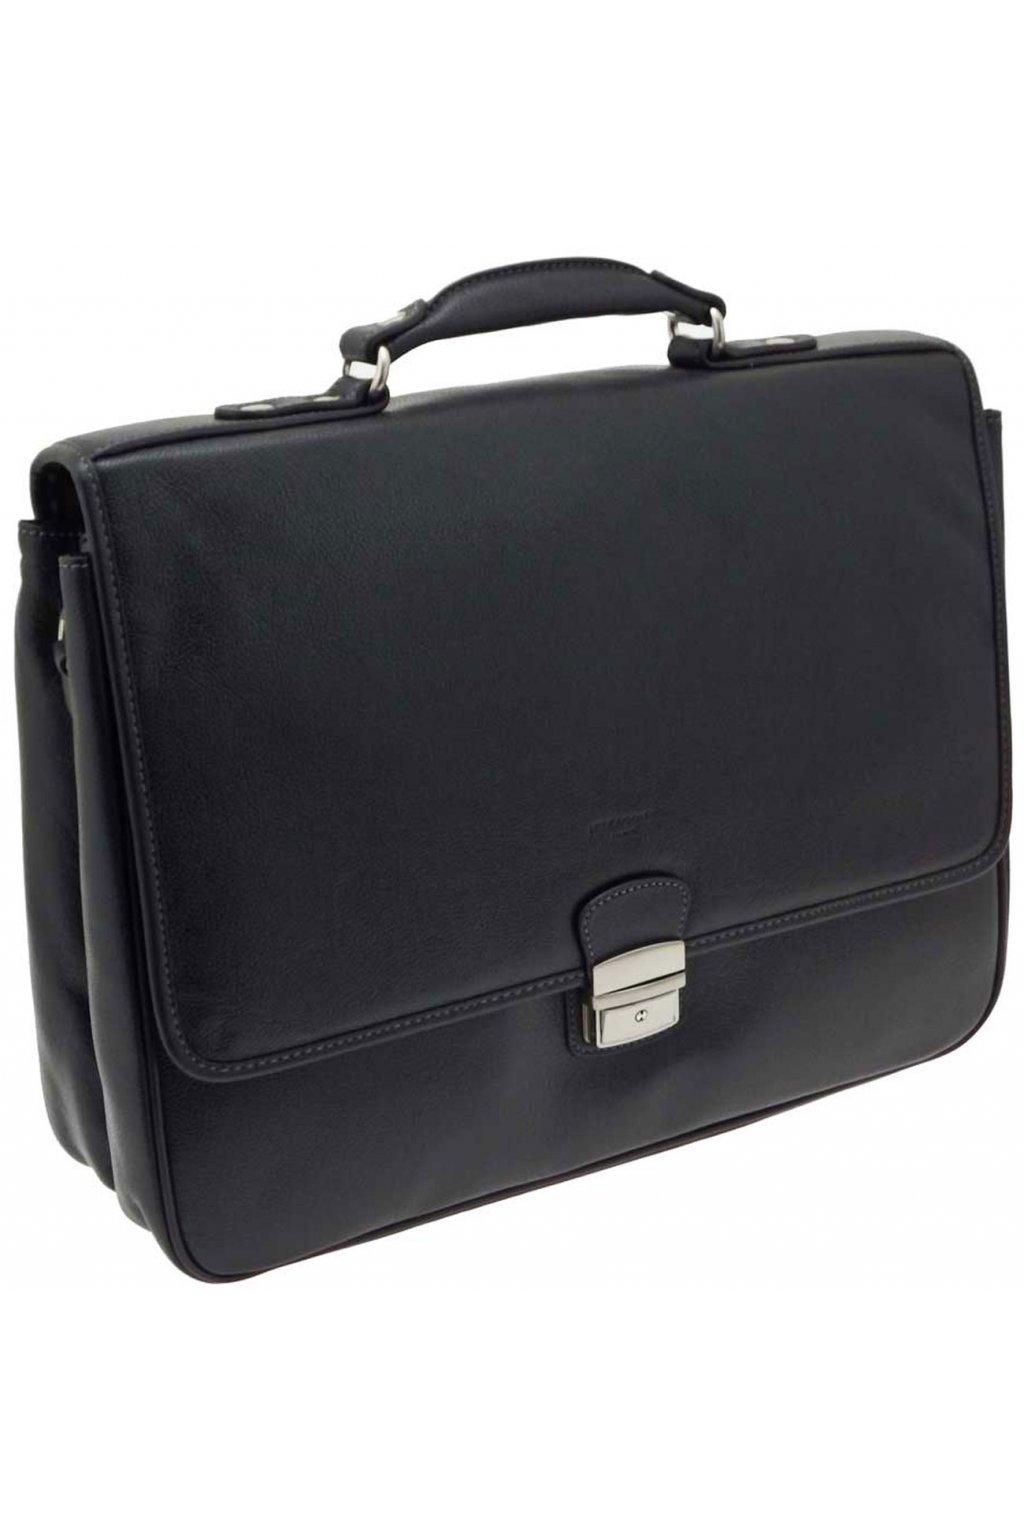 Pánská taška černa PTK03 461352 C